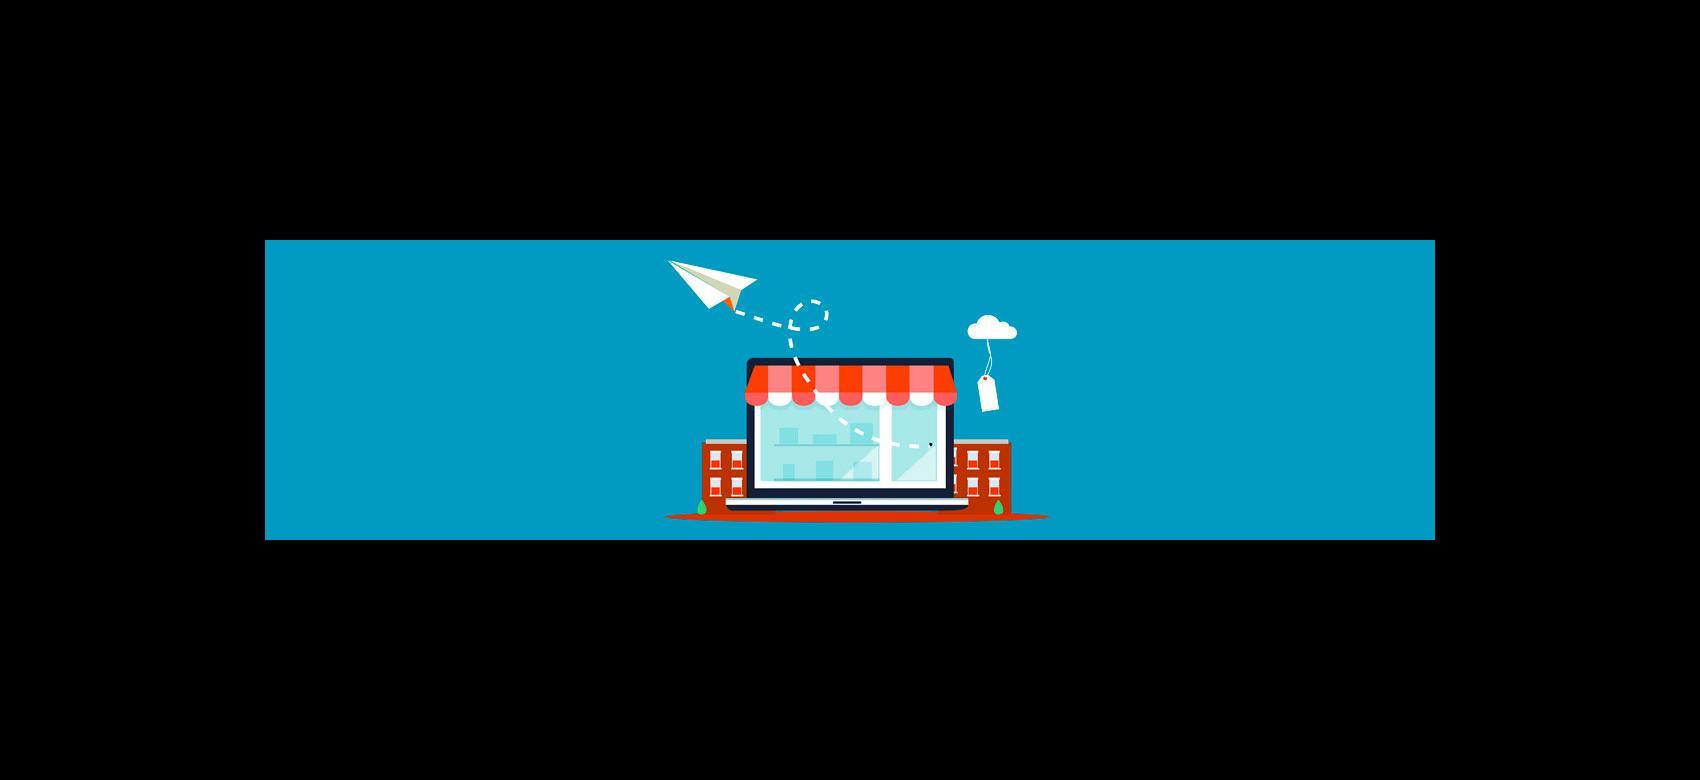 Compras online evitando fraudes